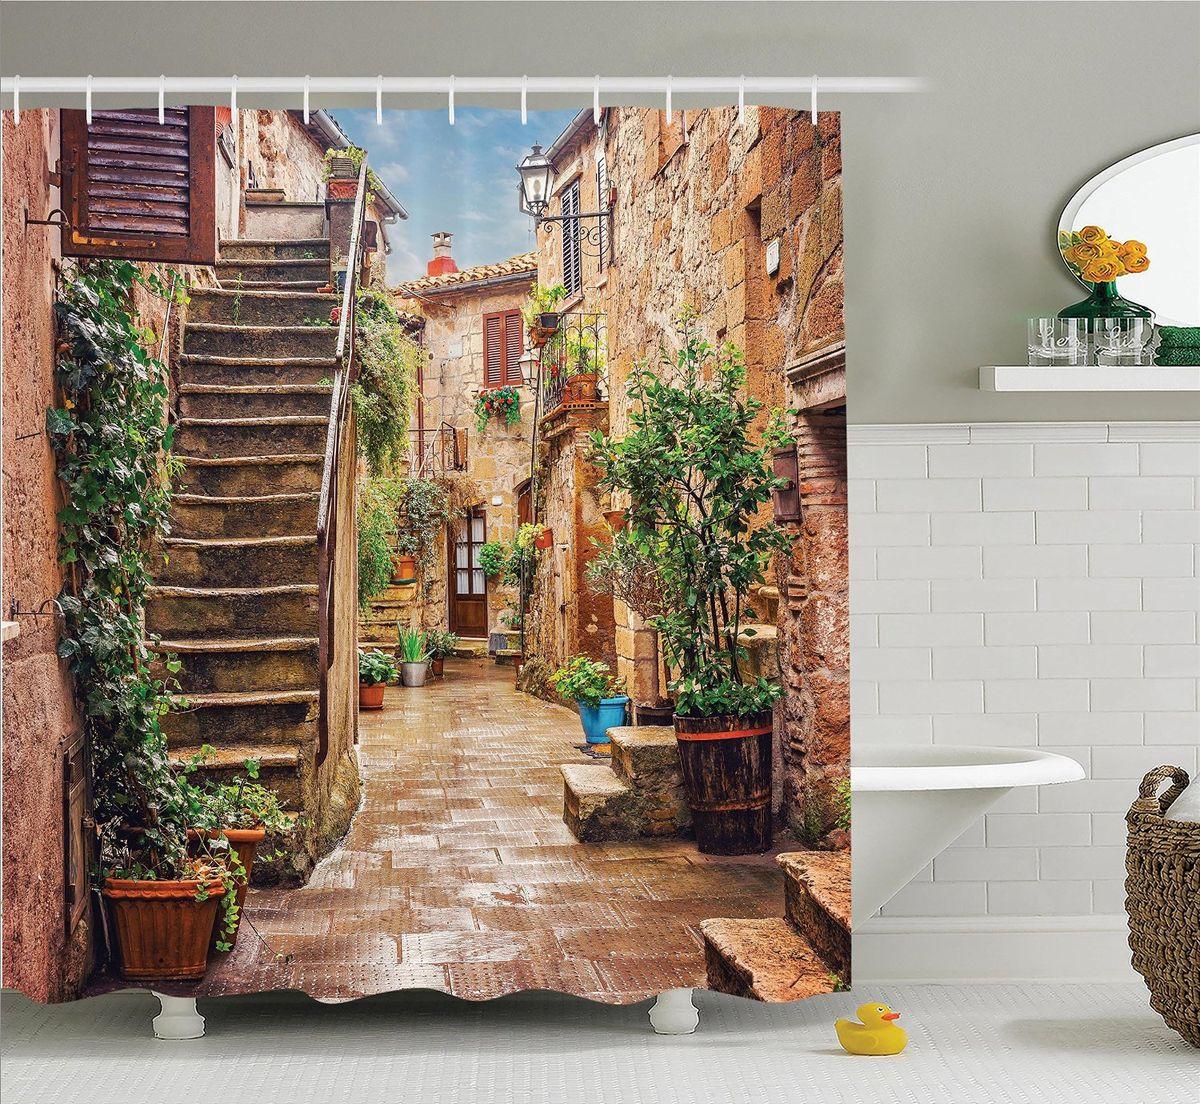 Штора для ванной комнаты Magic Lady Дом с каменной лестницей, 180 х 200 см цена